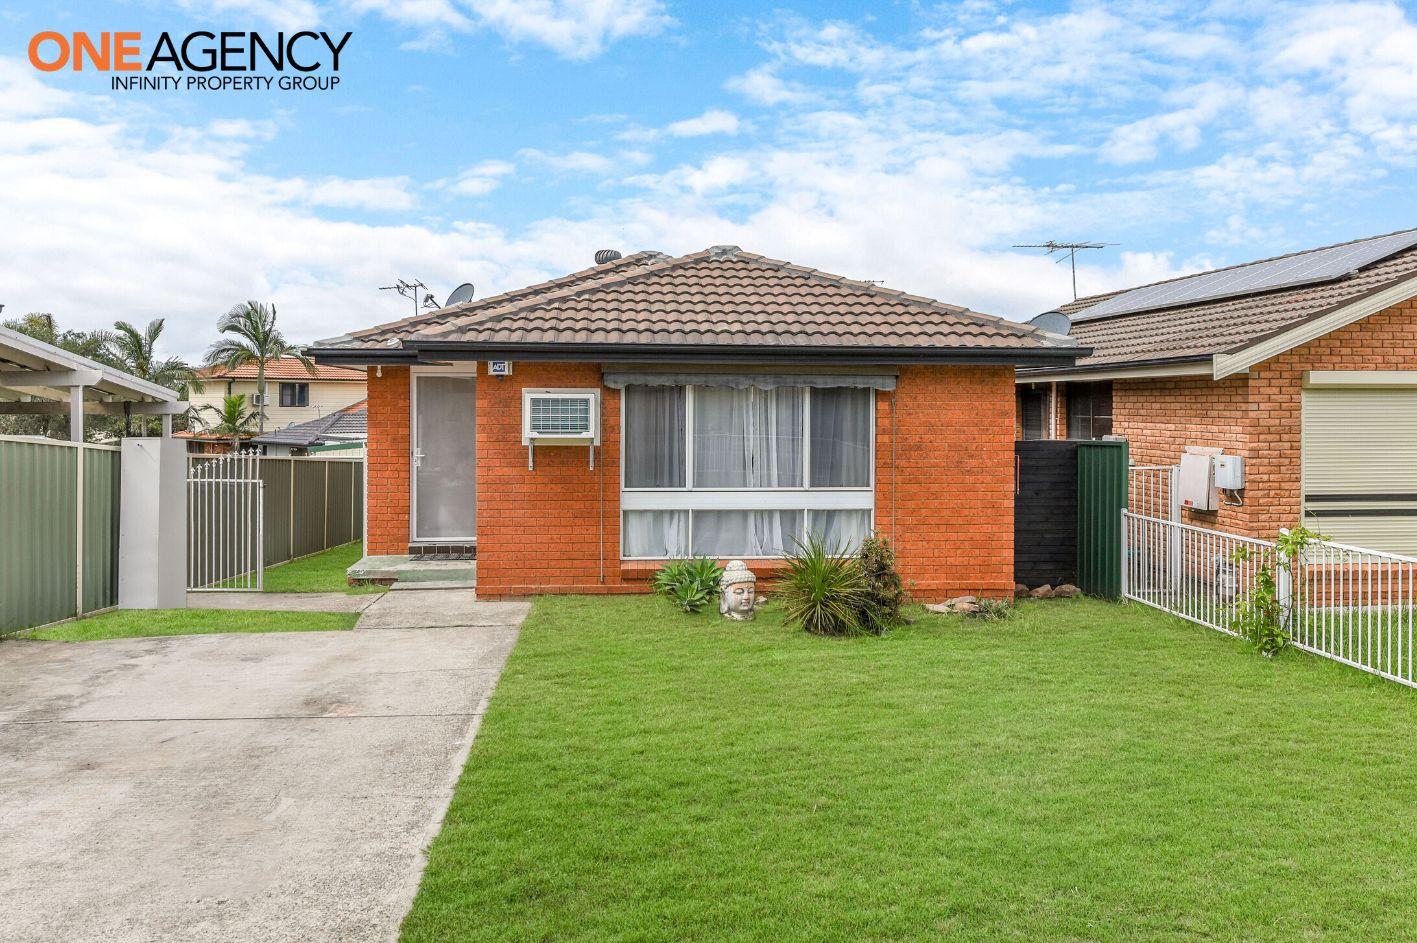 32 Goodsell Street, Minto NSW 2566, Image 0